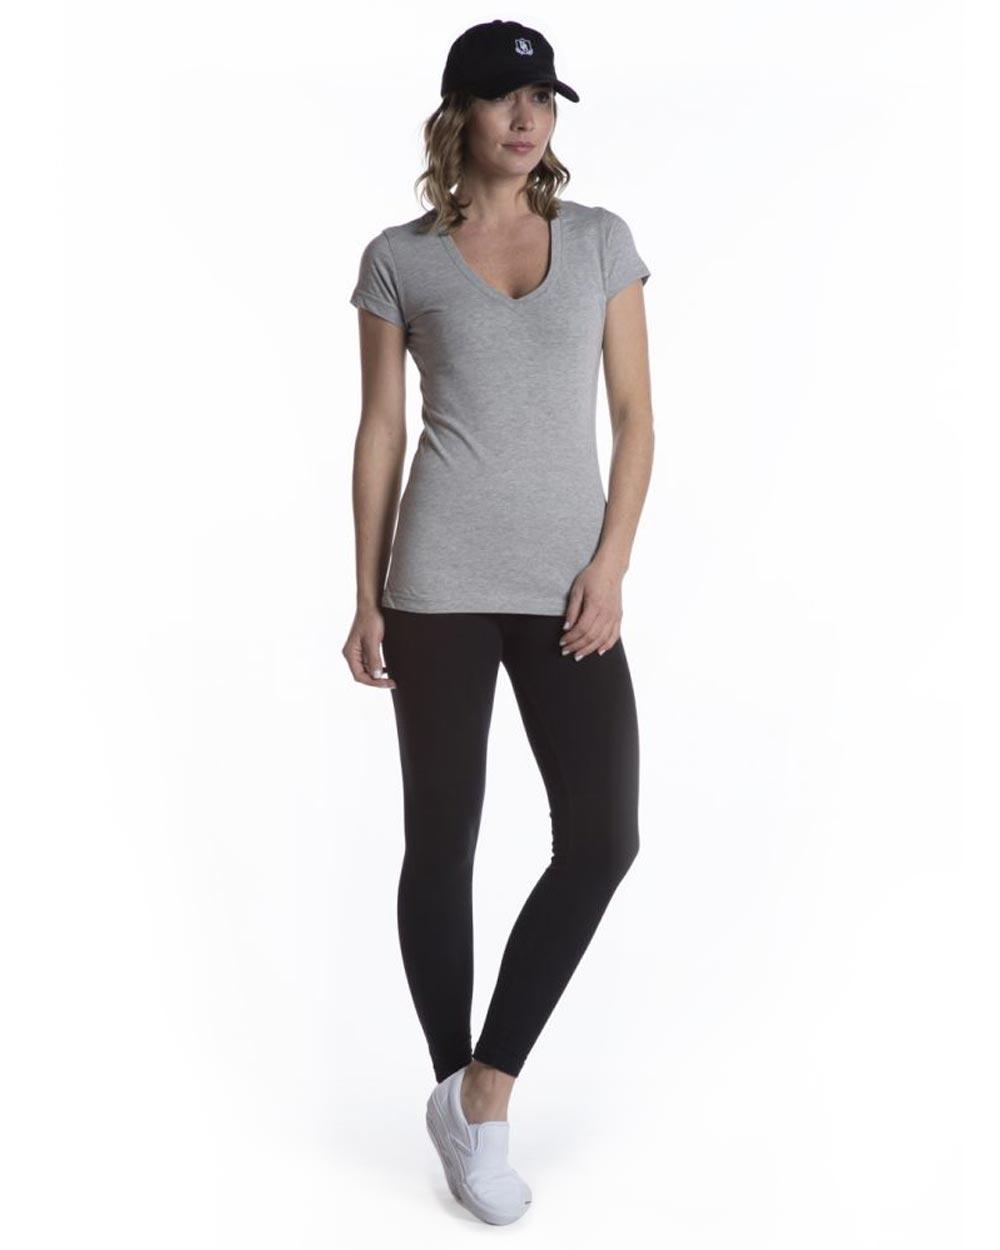 HS Apparel Women's V-Neck T-Shirt